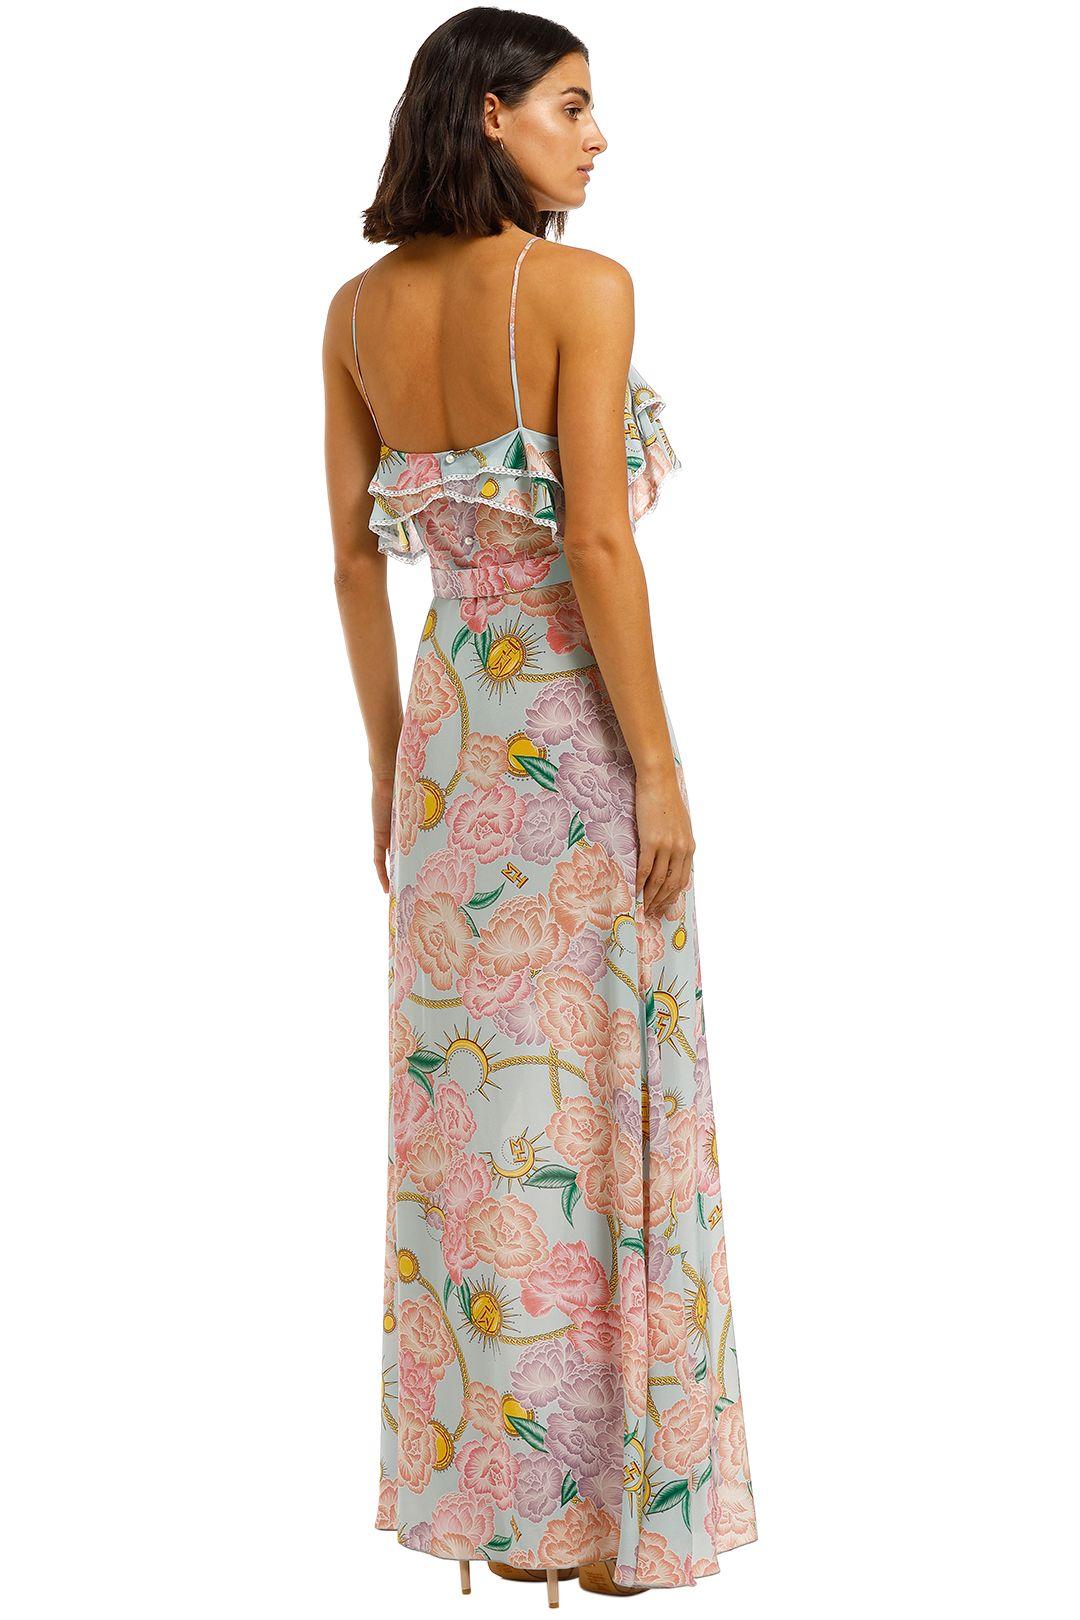 Hayley-Menzies-Maxi-Frill-Dress-Floral-Print-Back